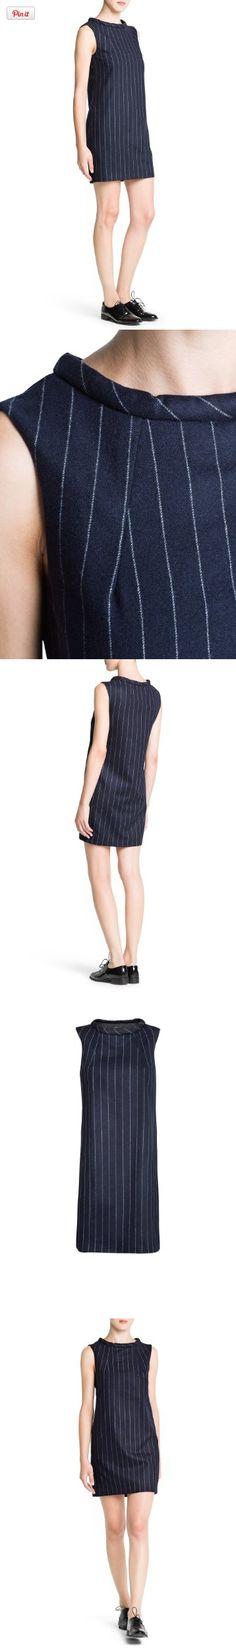 Mango Women's Pinstripe Wool Dress, Dark Blue #purchased